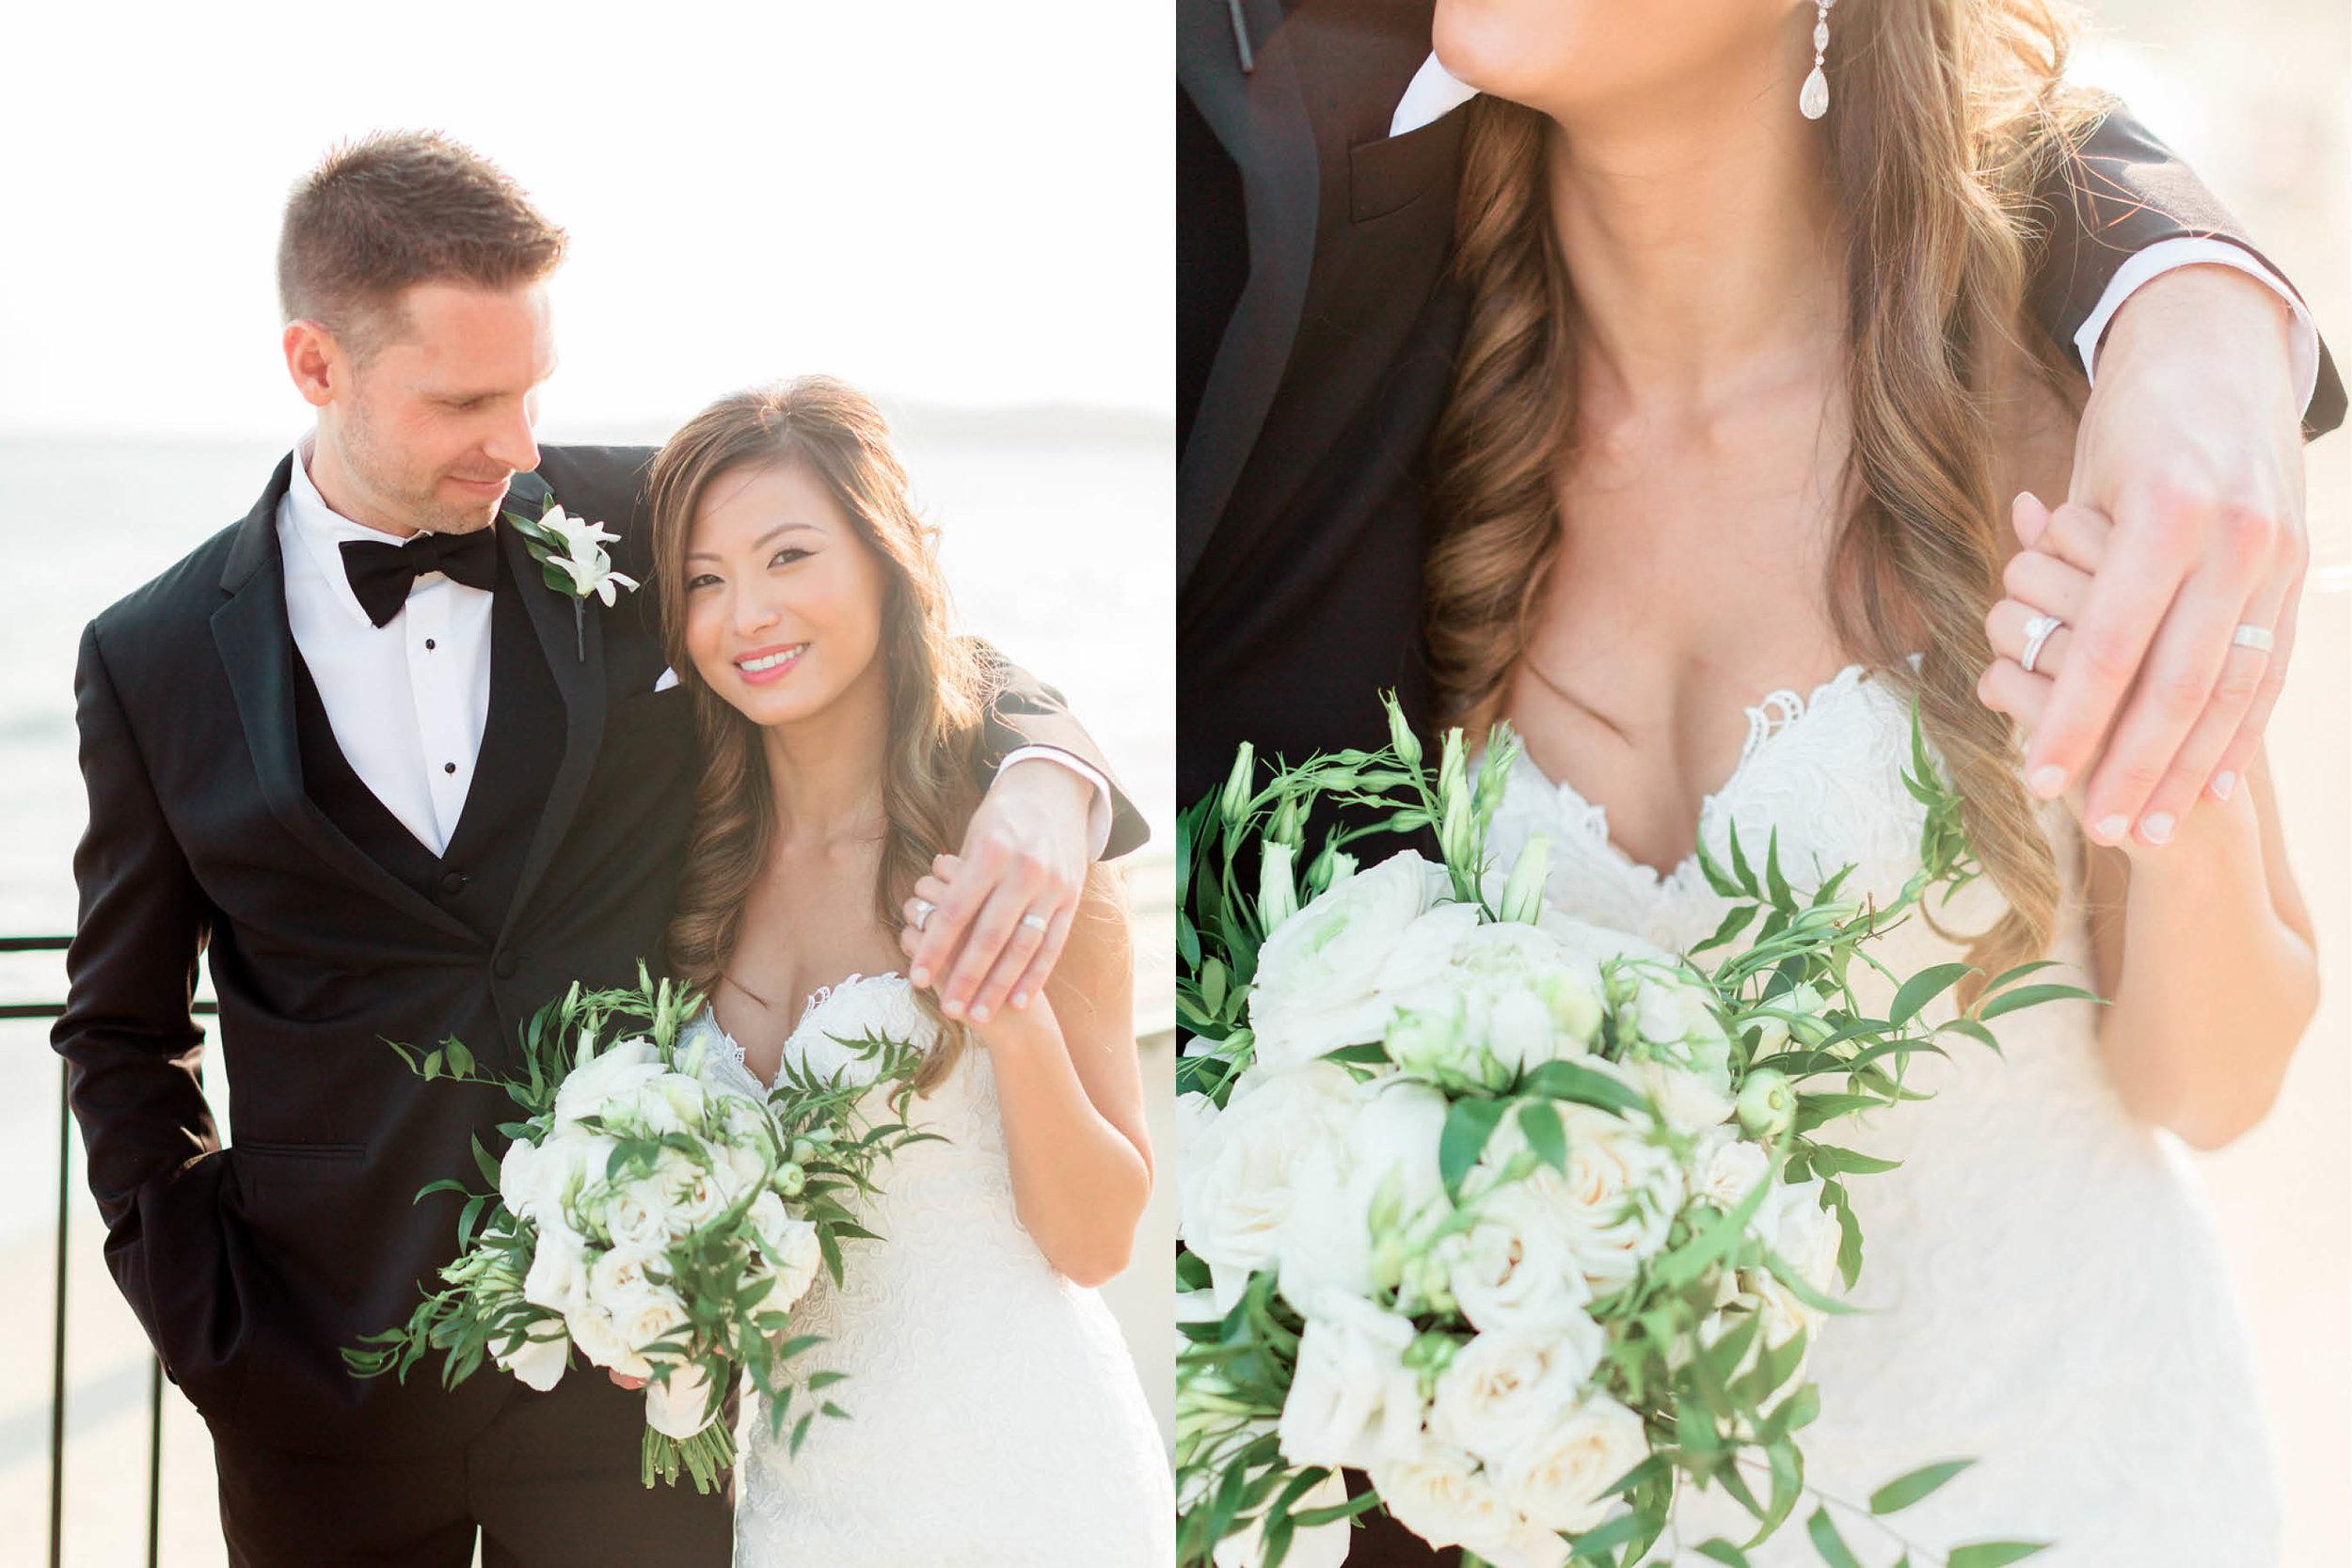 santa-barbara-elopement-elope-wedding-planner-coordinator-day-of-four-seasons-biltmore-ocean-front-view-garden-pink-white-green-montecito-black-tie (14).jpg